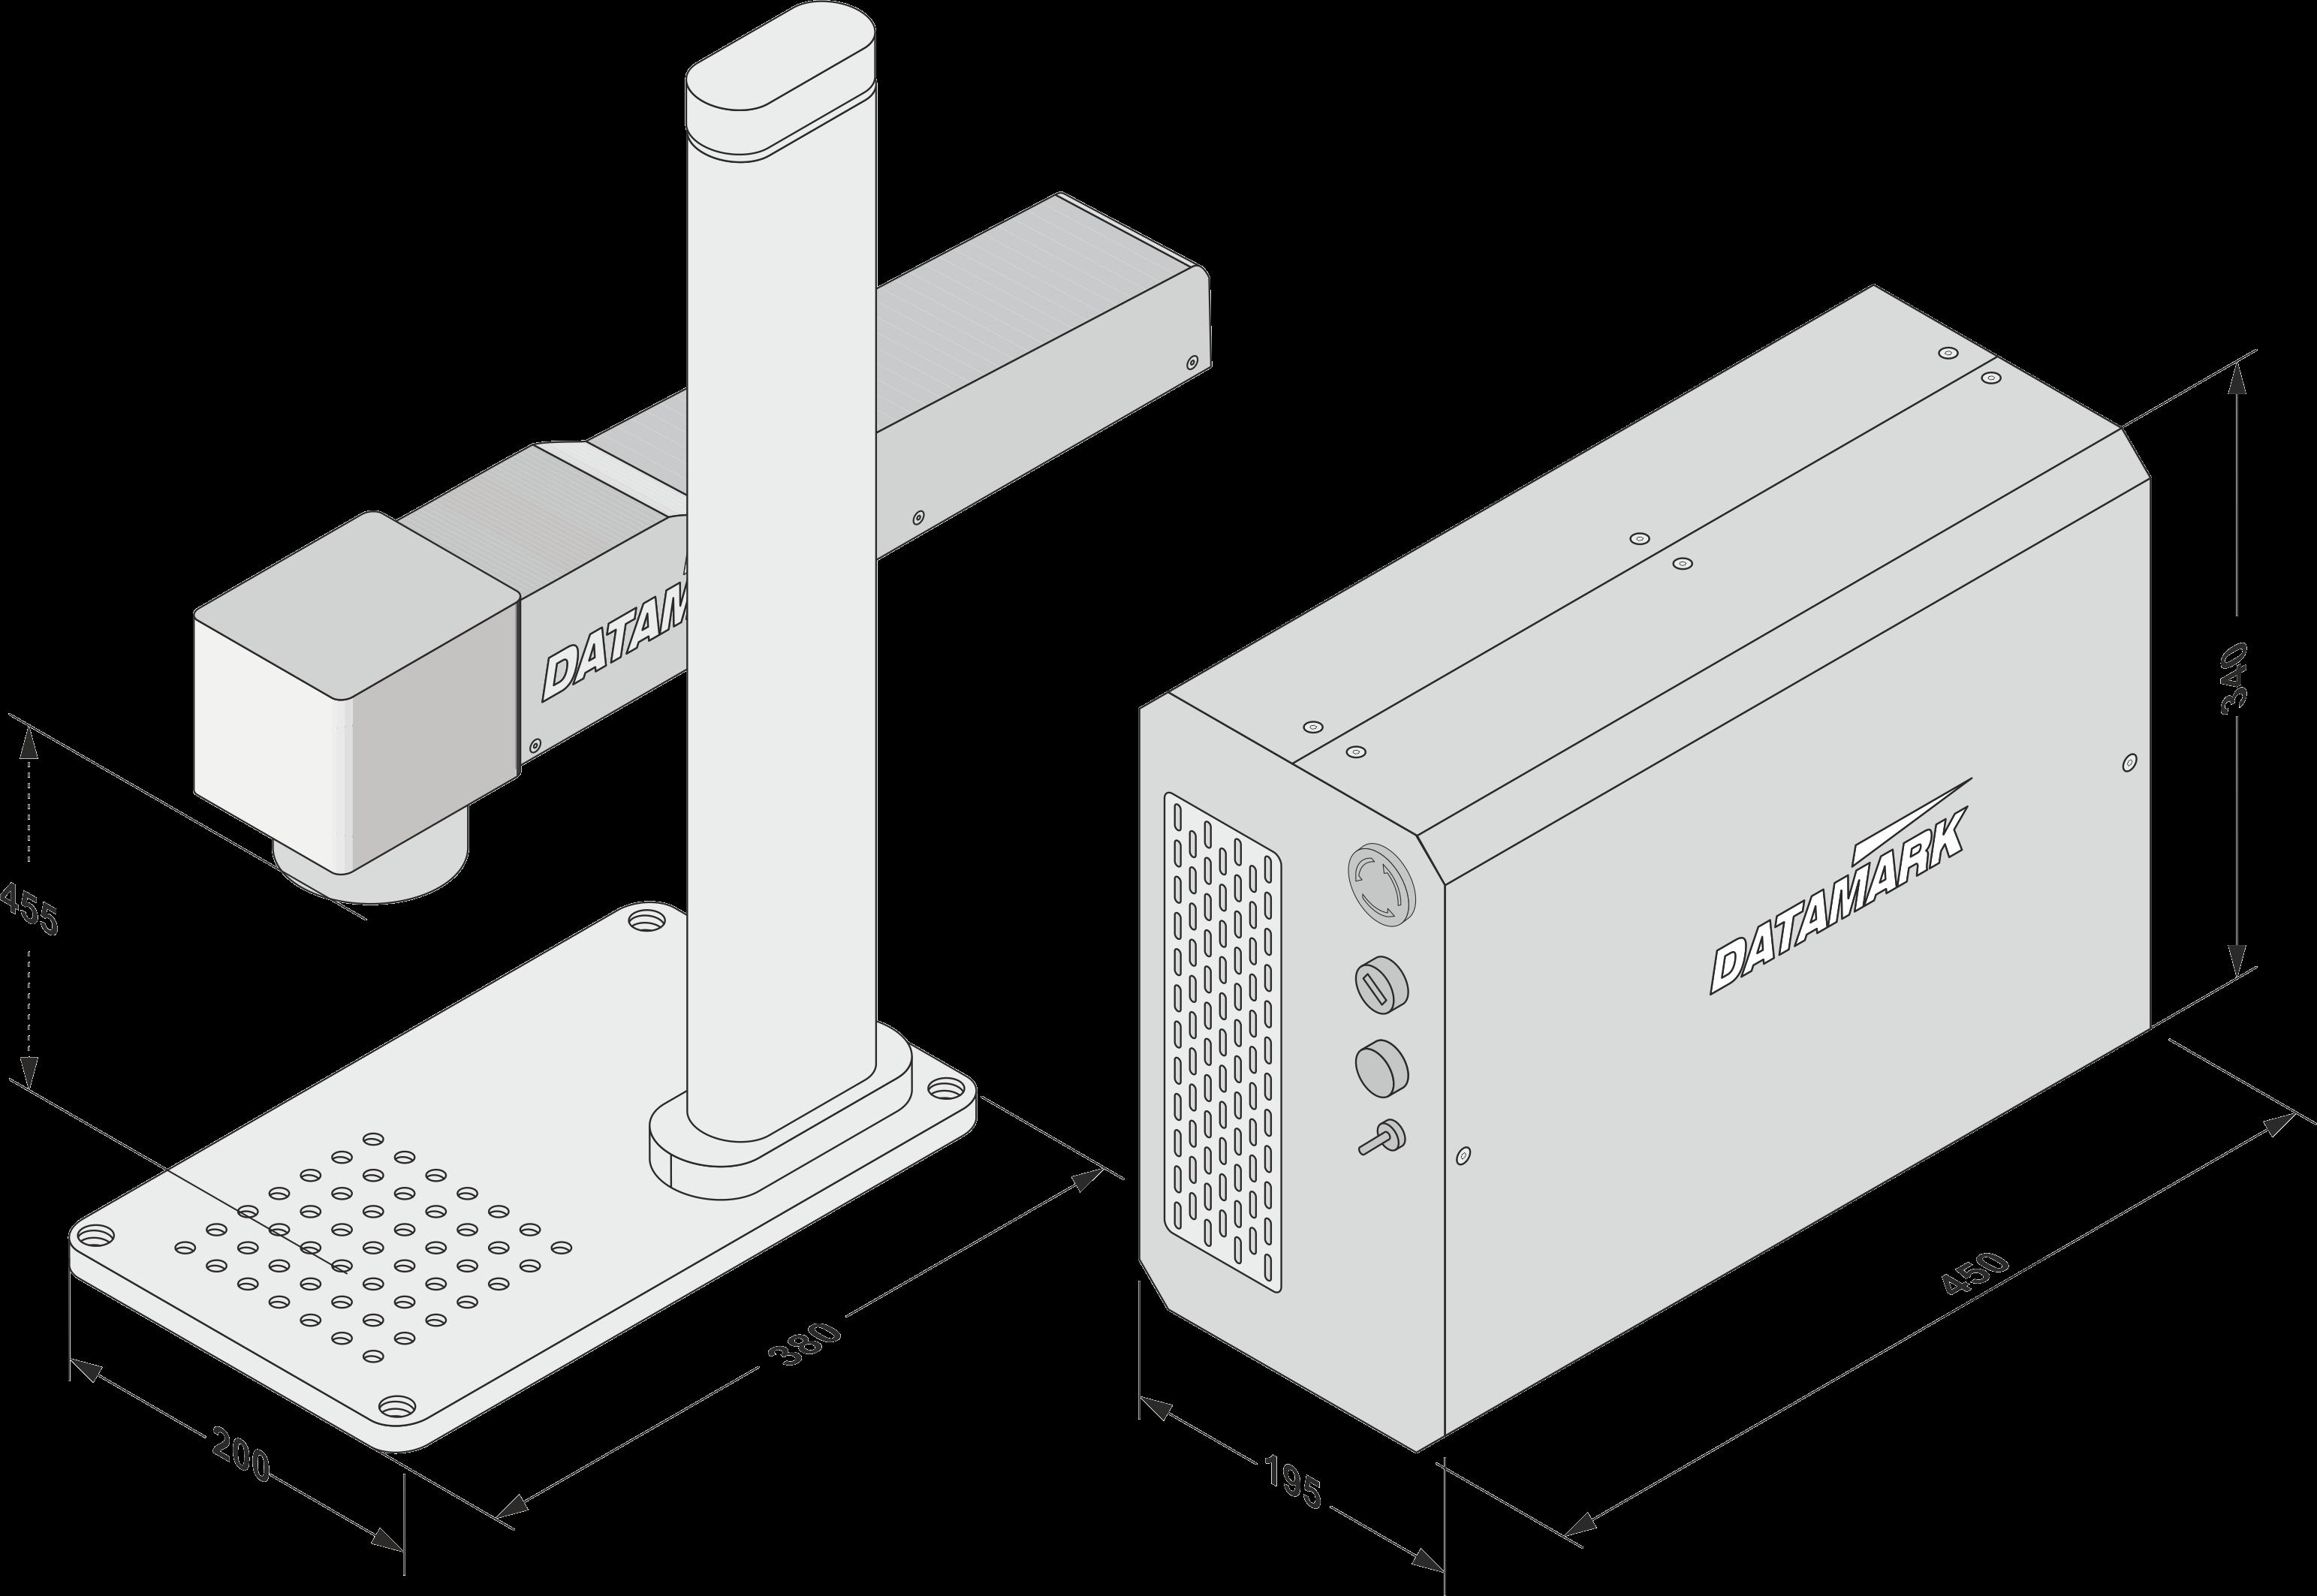 Dimensiones de la maquina de marcaje Datamark ML-200